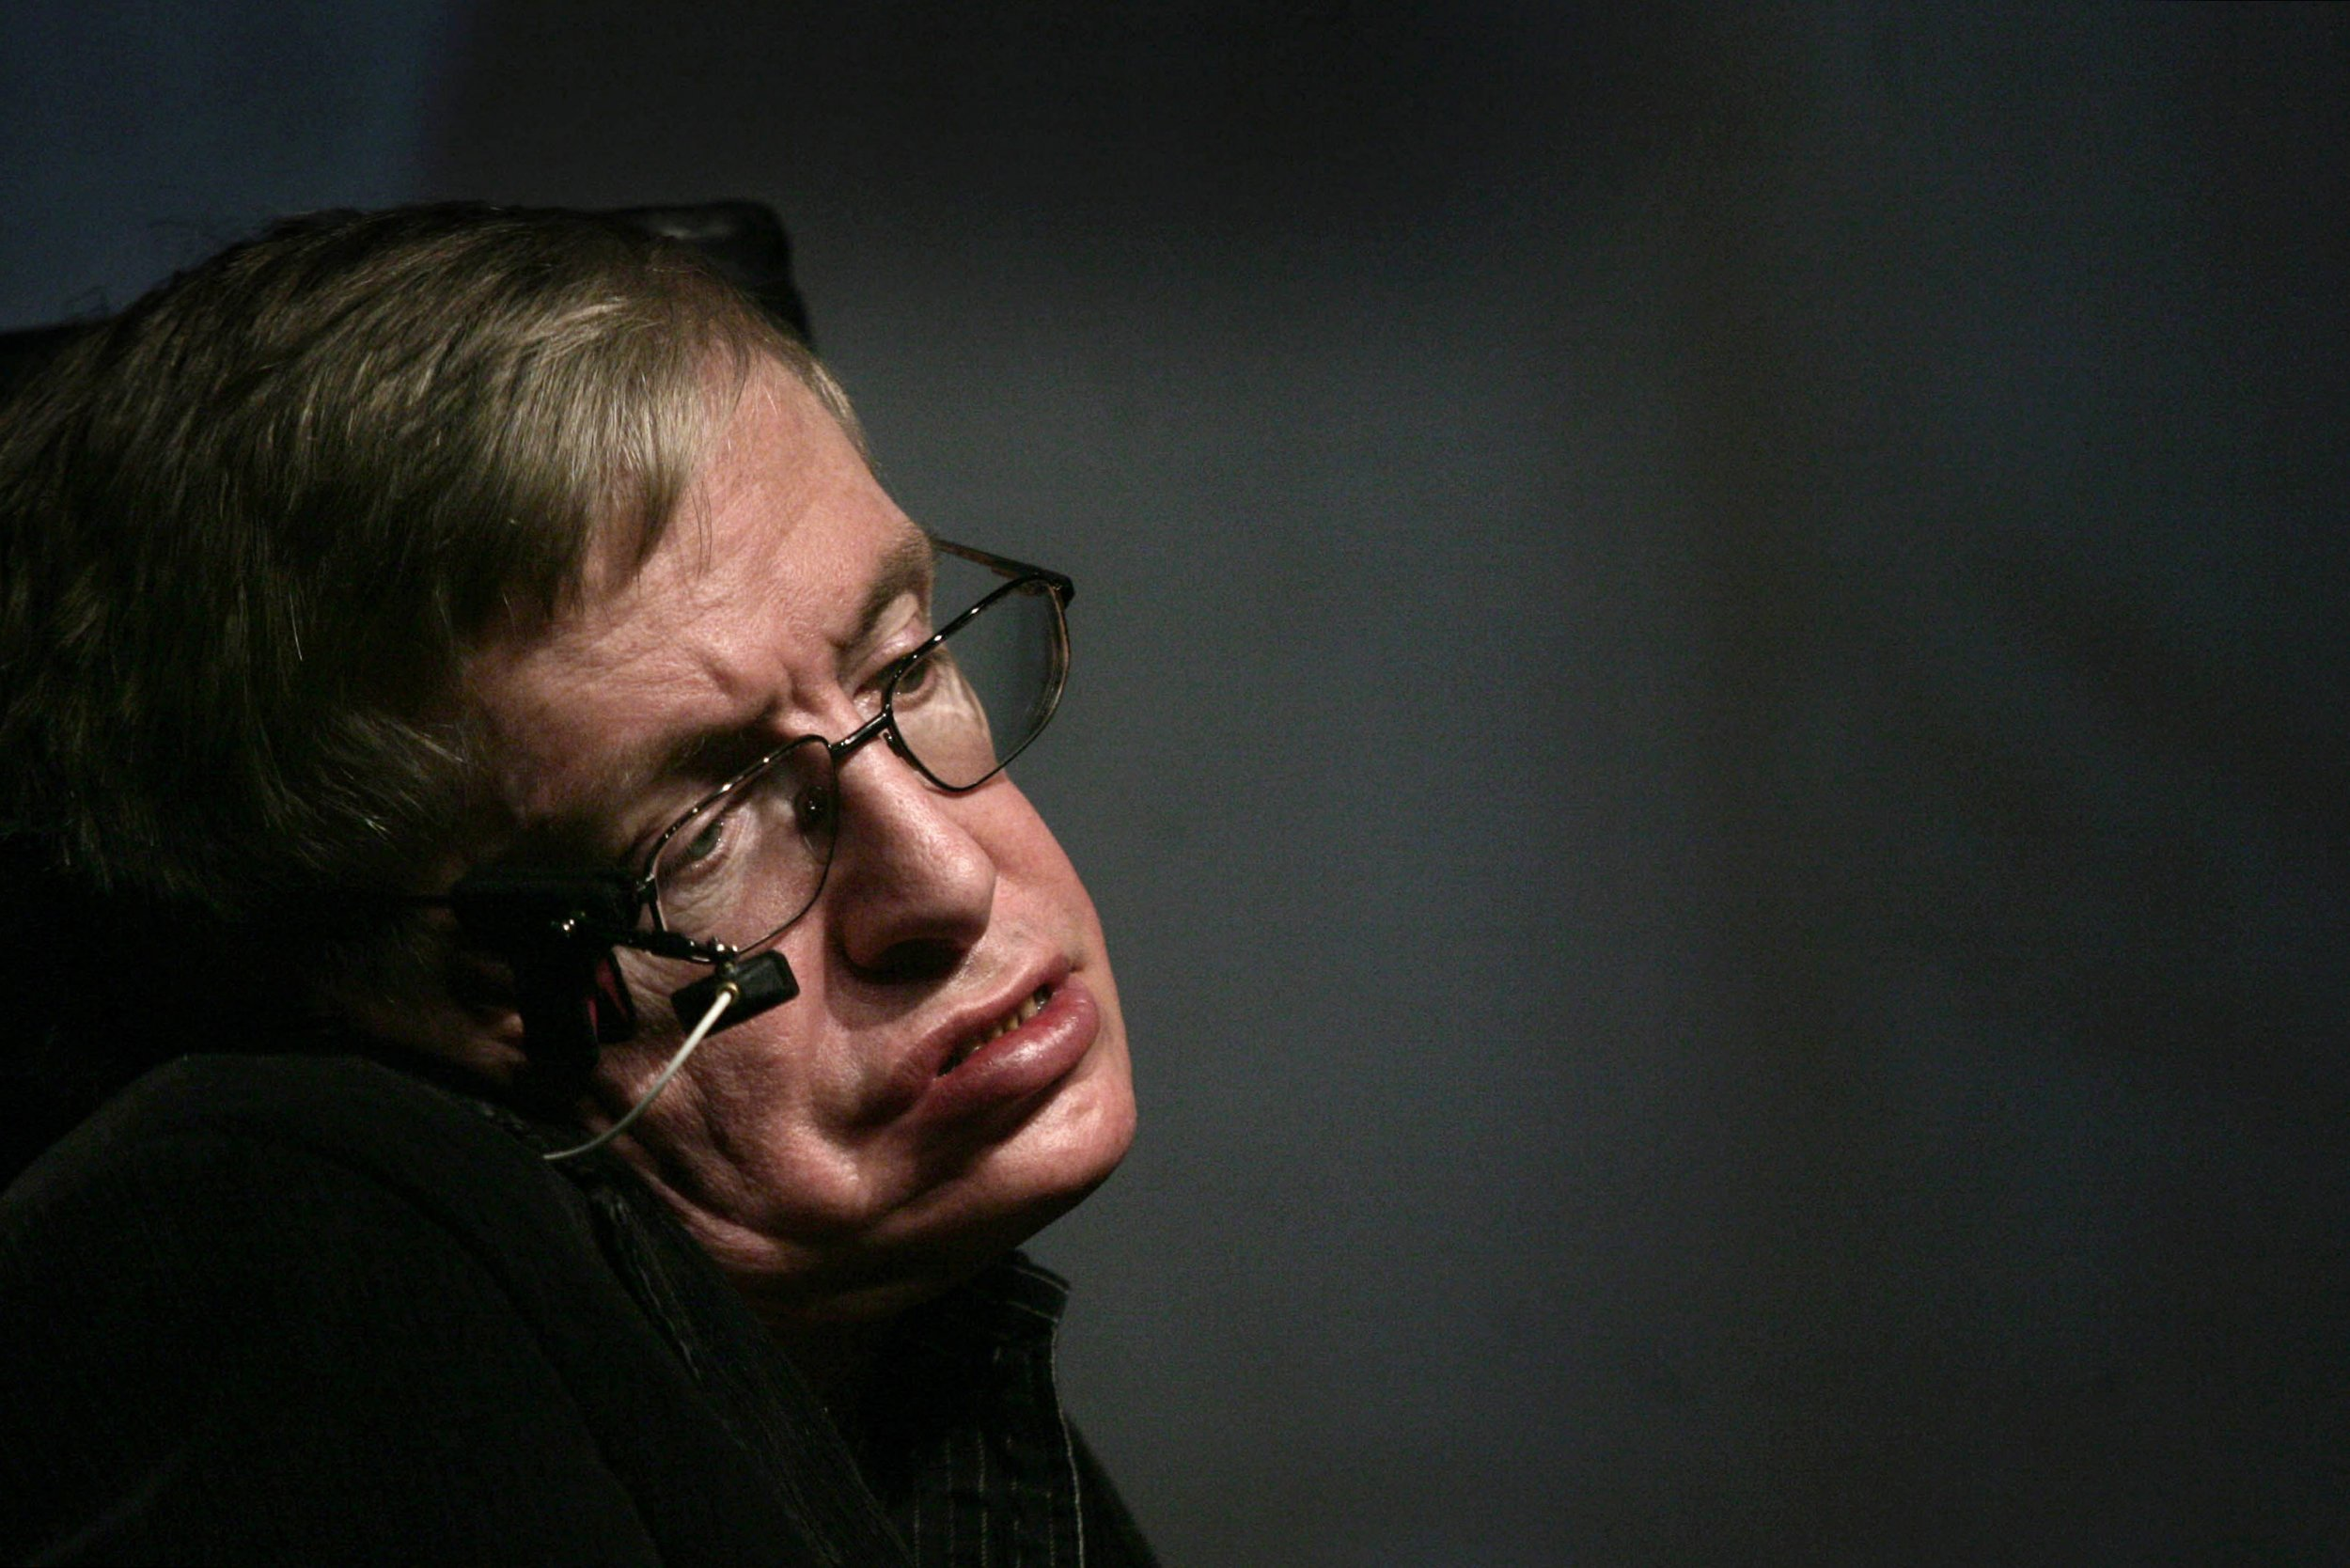 05_14_Hawking_01